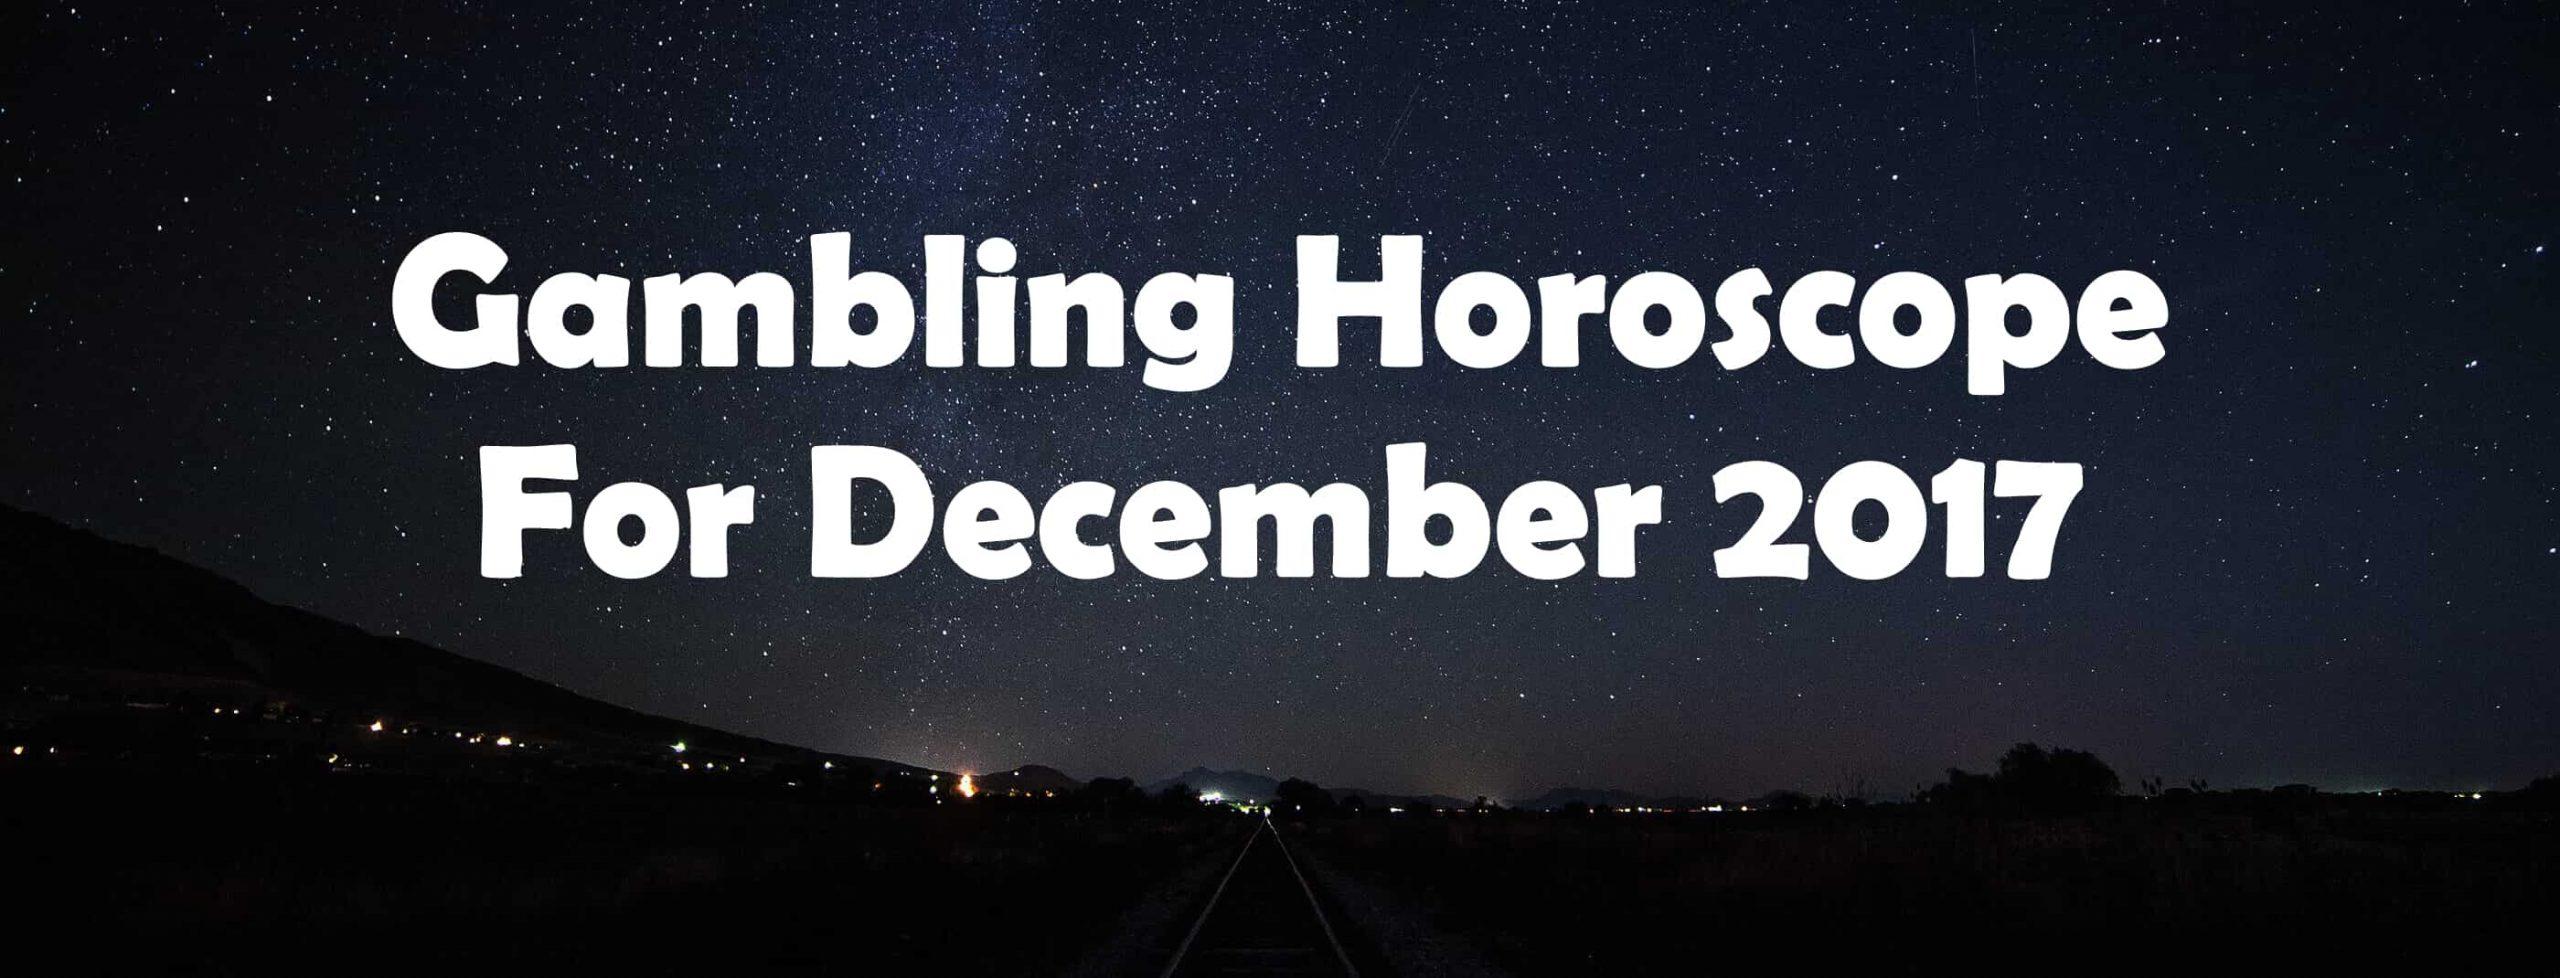 gambling-horoscope